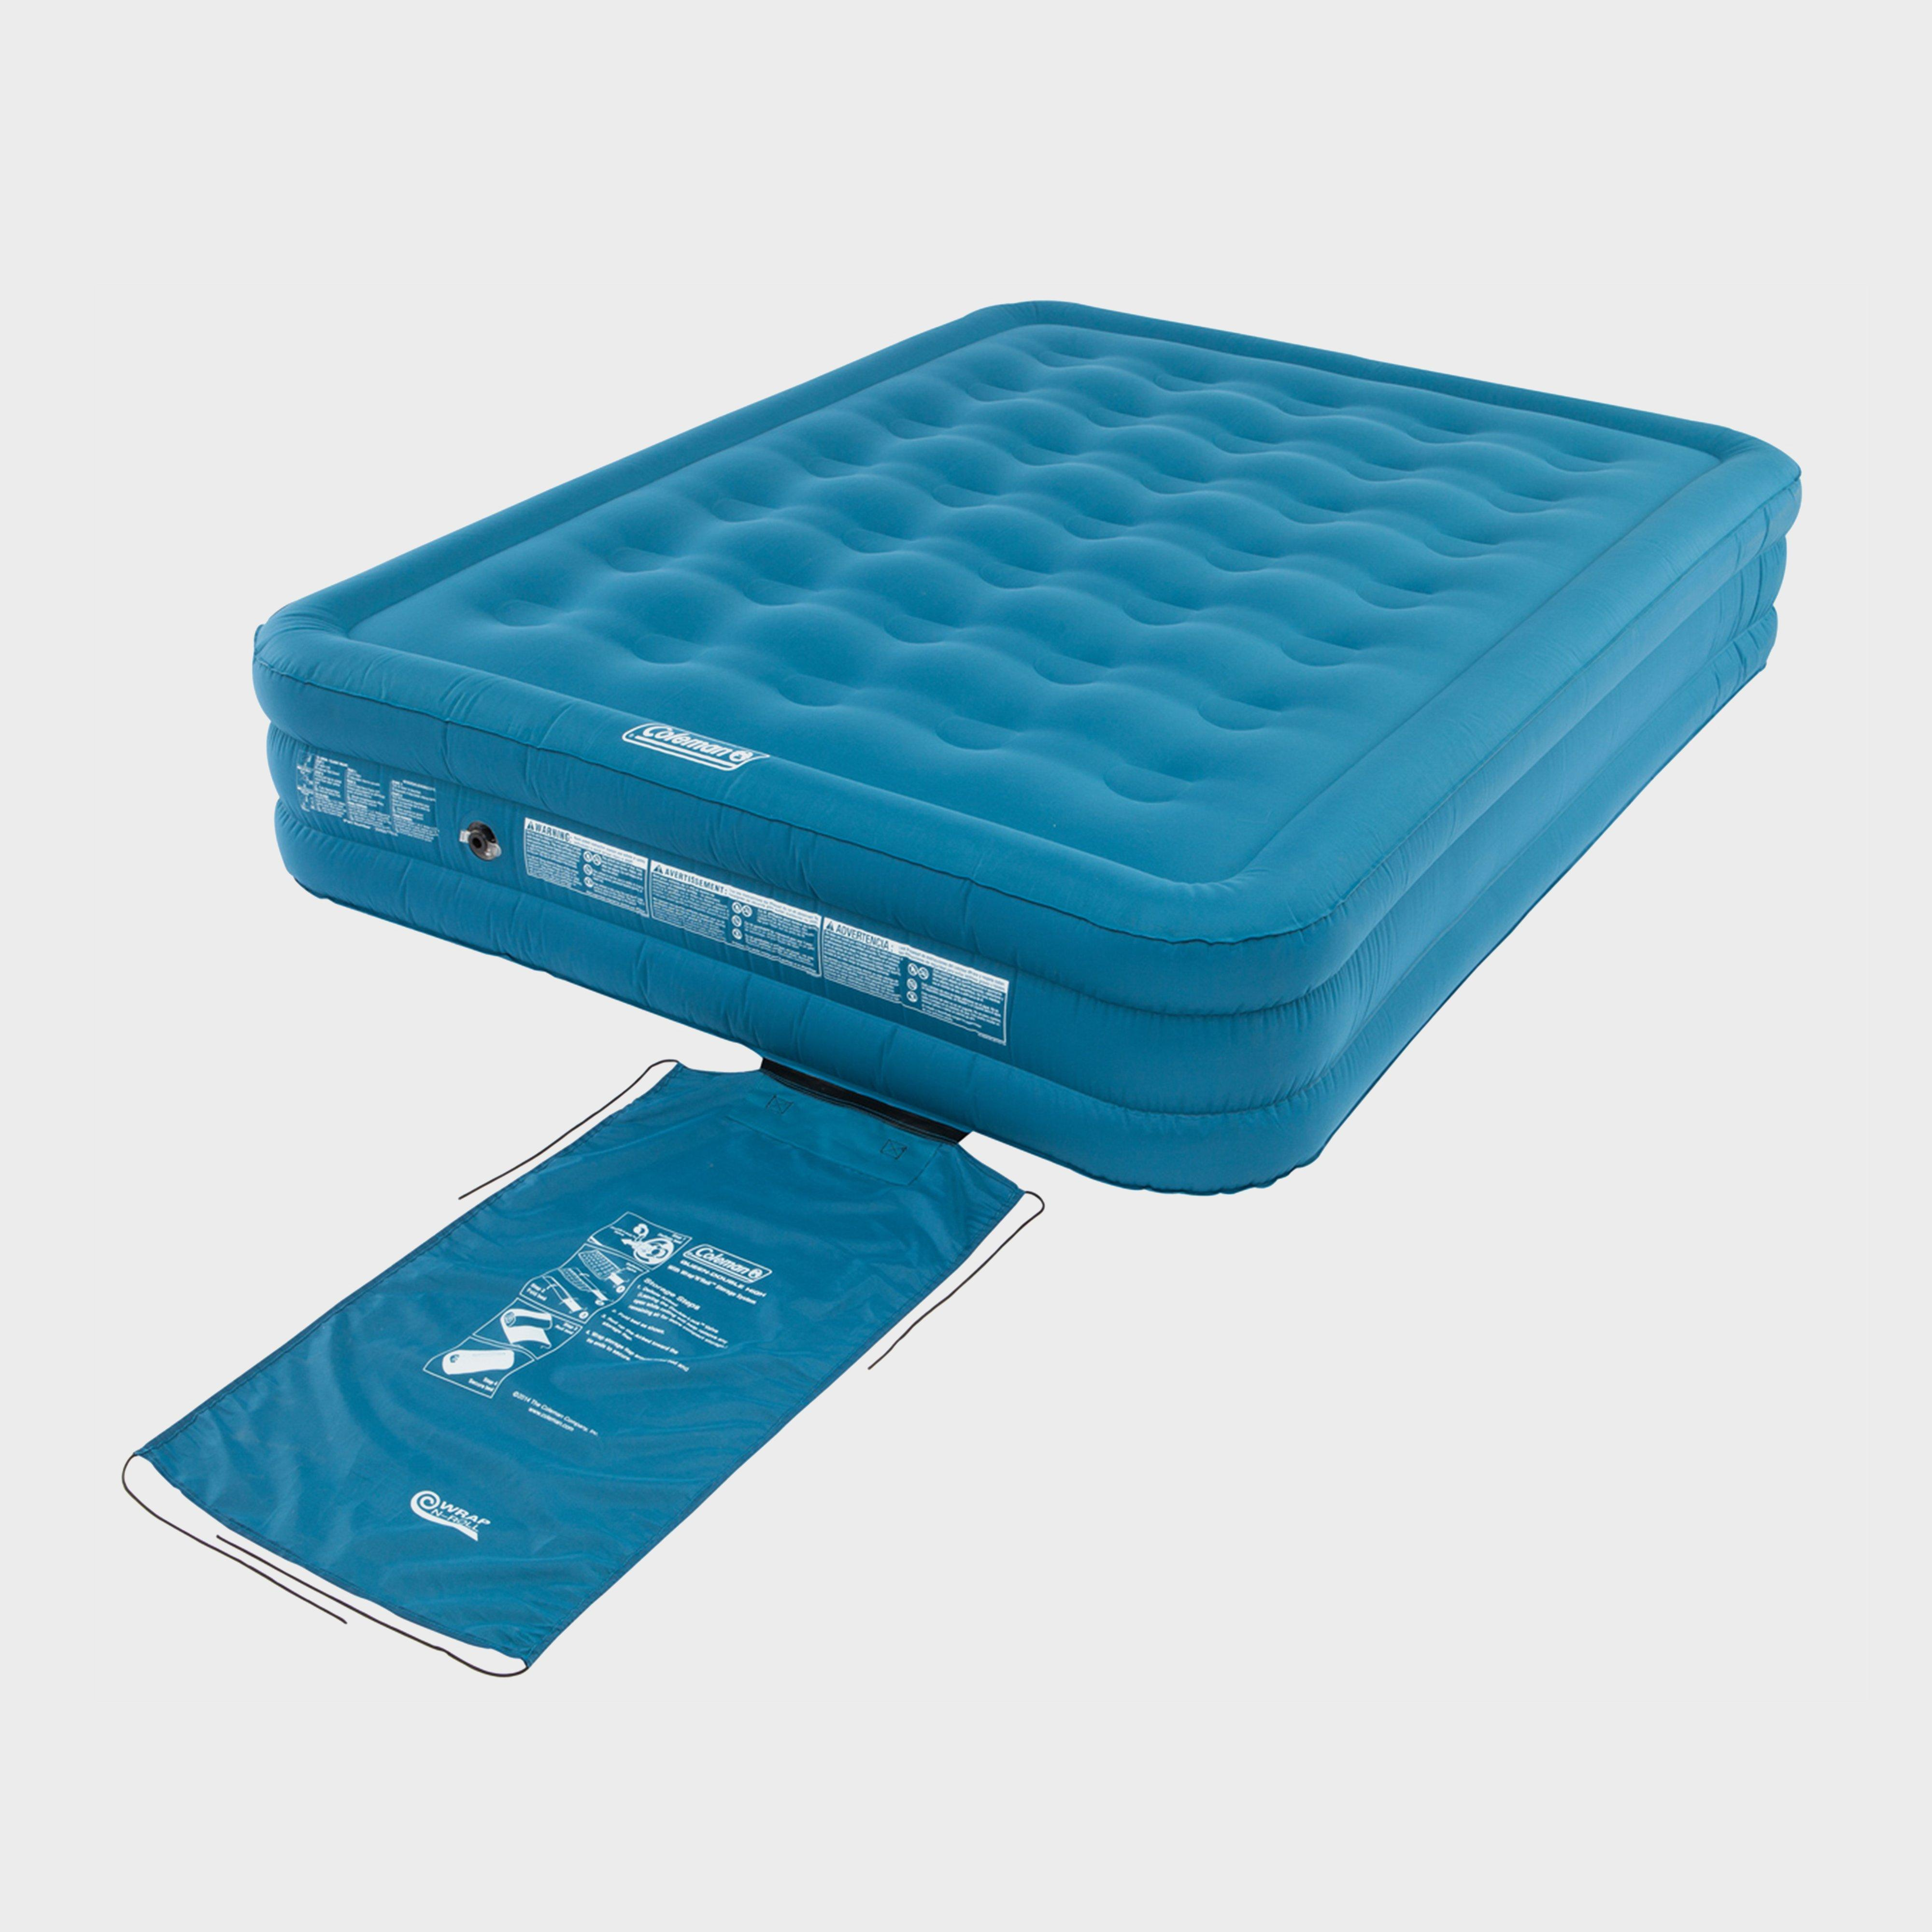 Coleman Extra Durable Raised - Blue/doub  Blue/doub